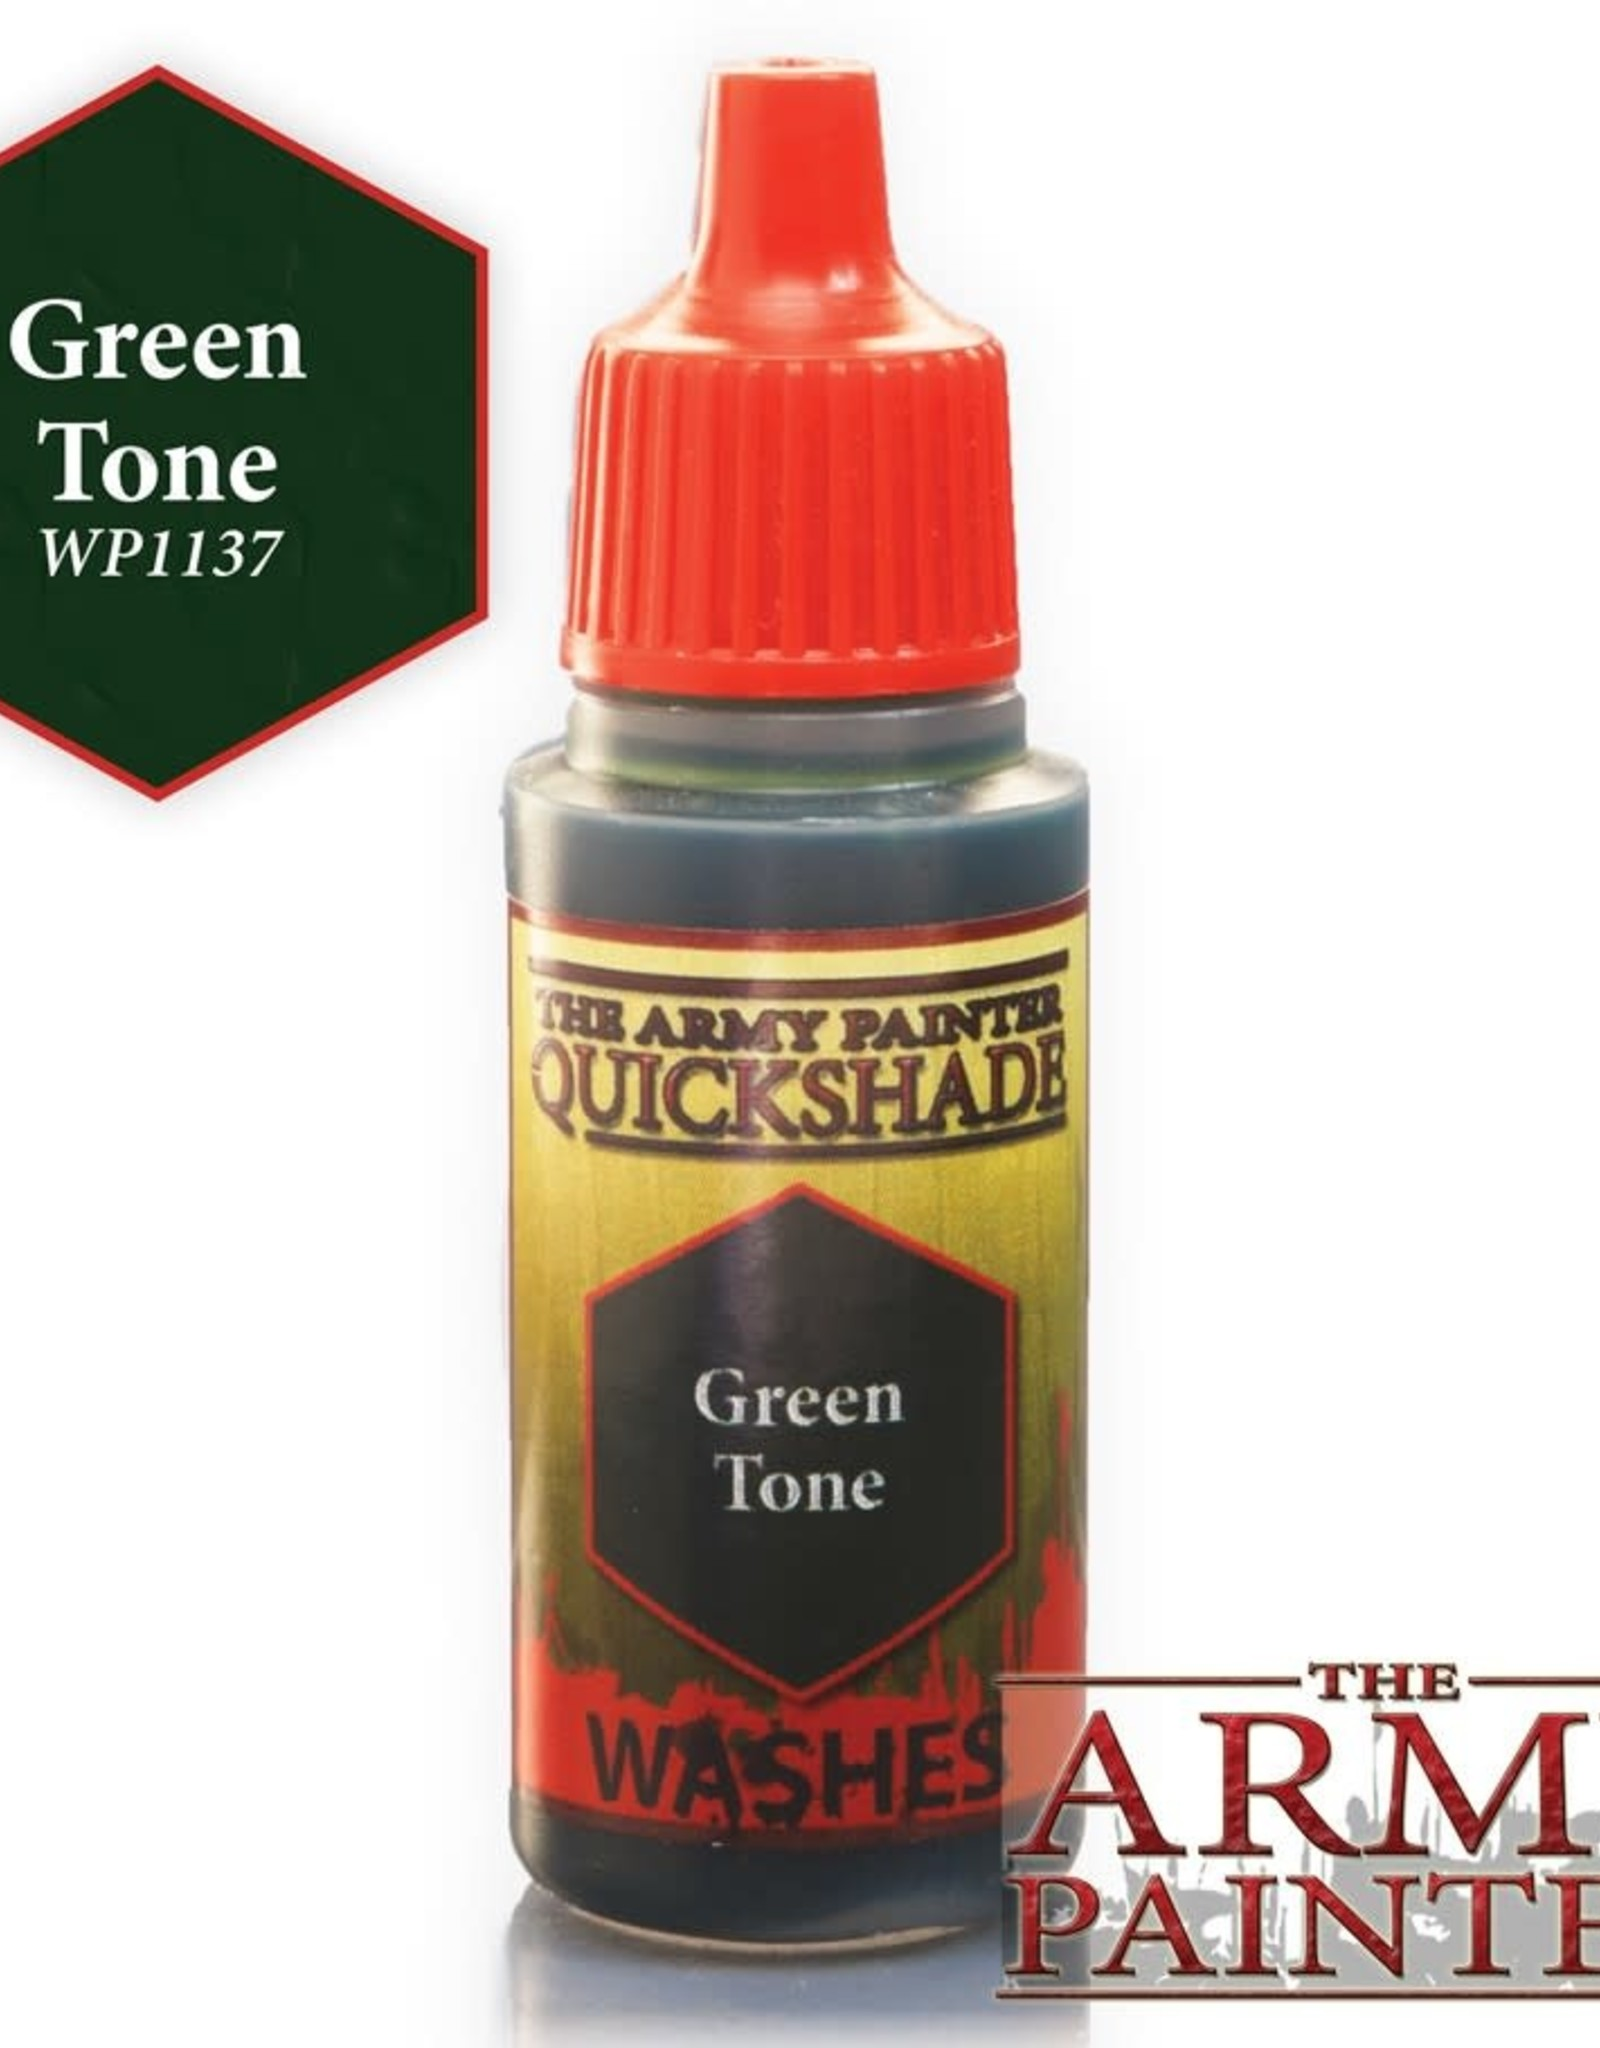 Quickshade: Green Tone Ink